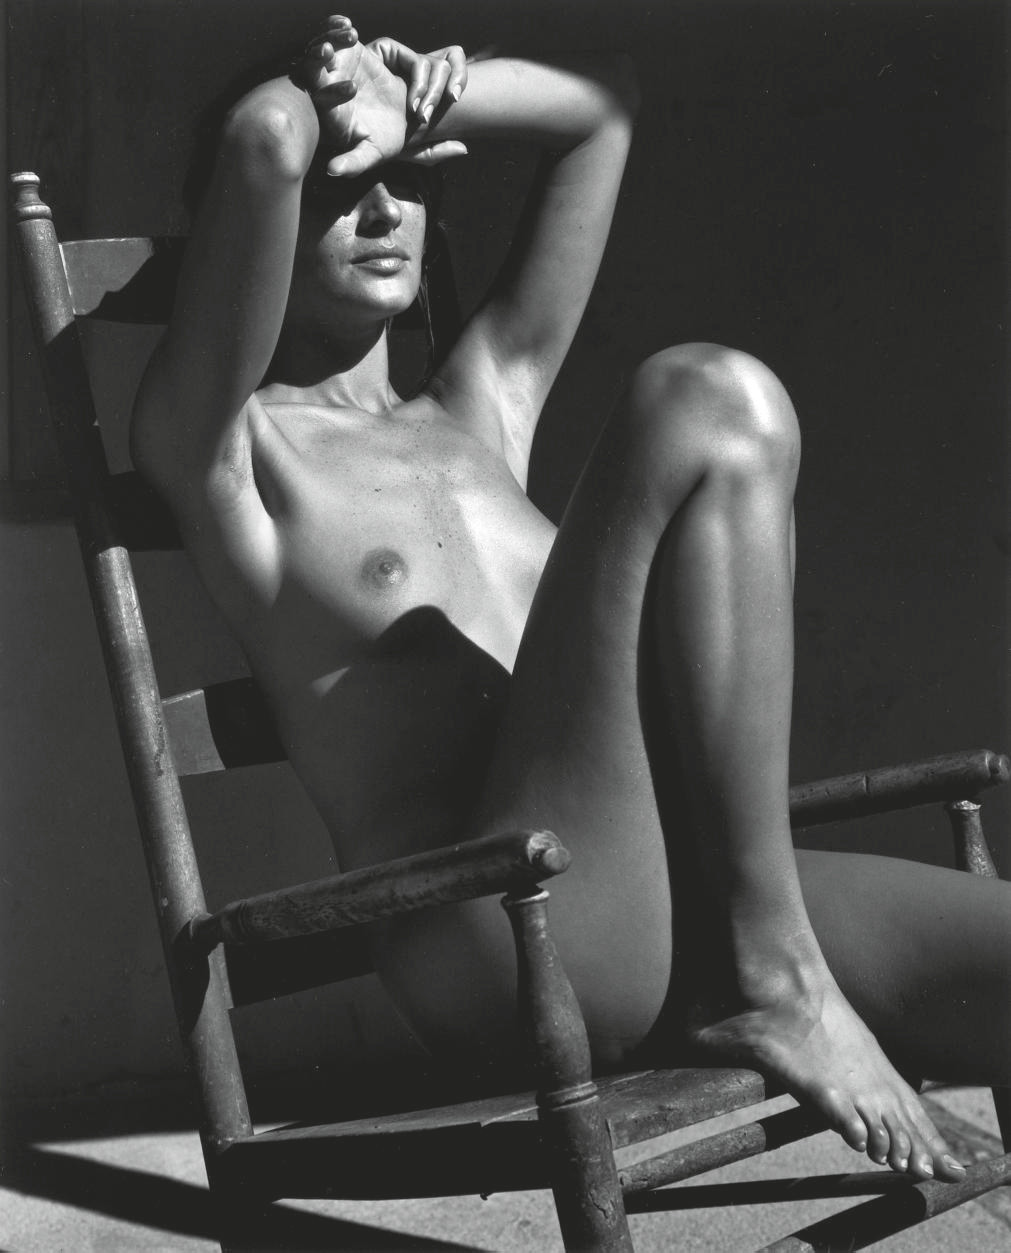 Cynthia Antonio, Santa Fe, New Mexico, 1990